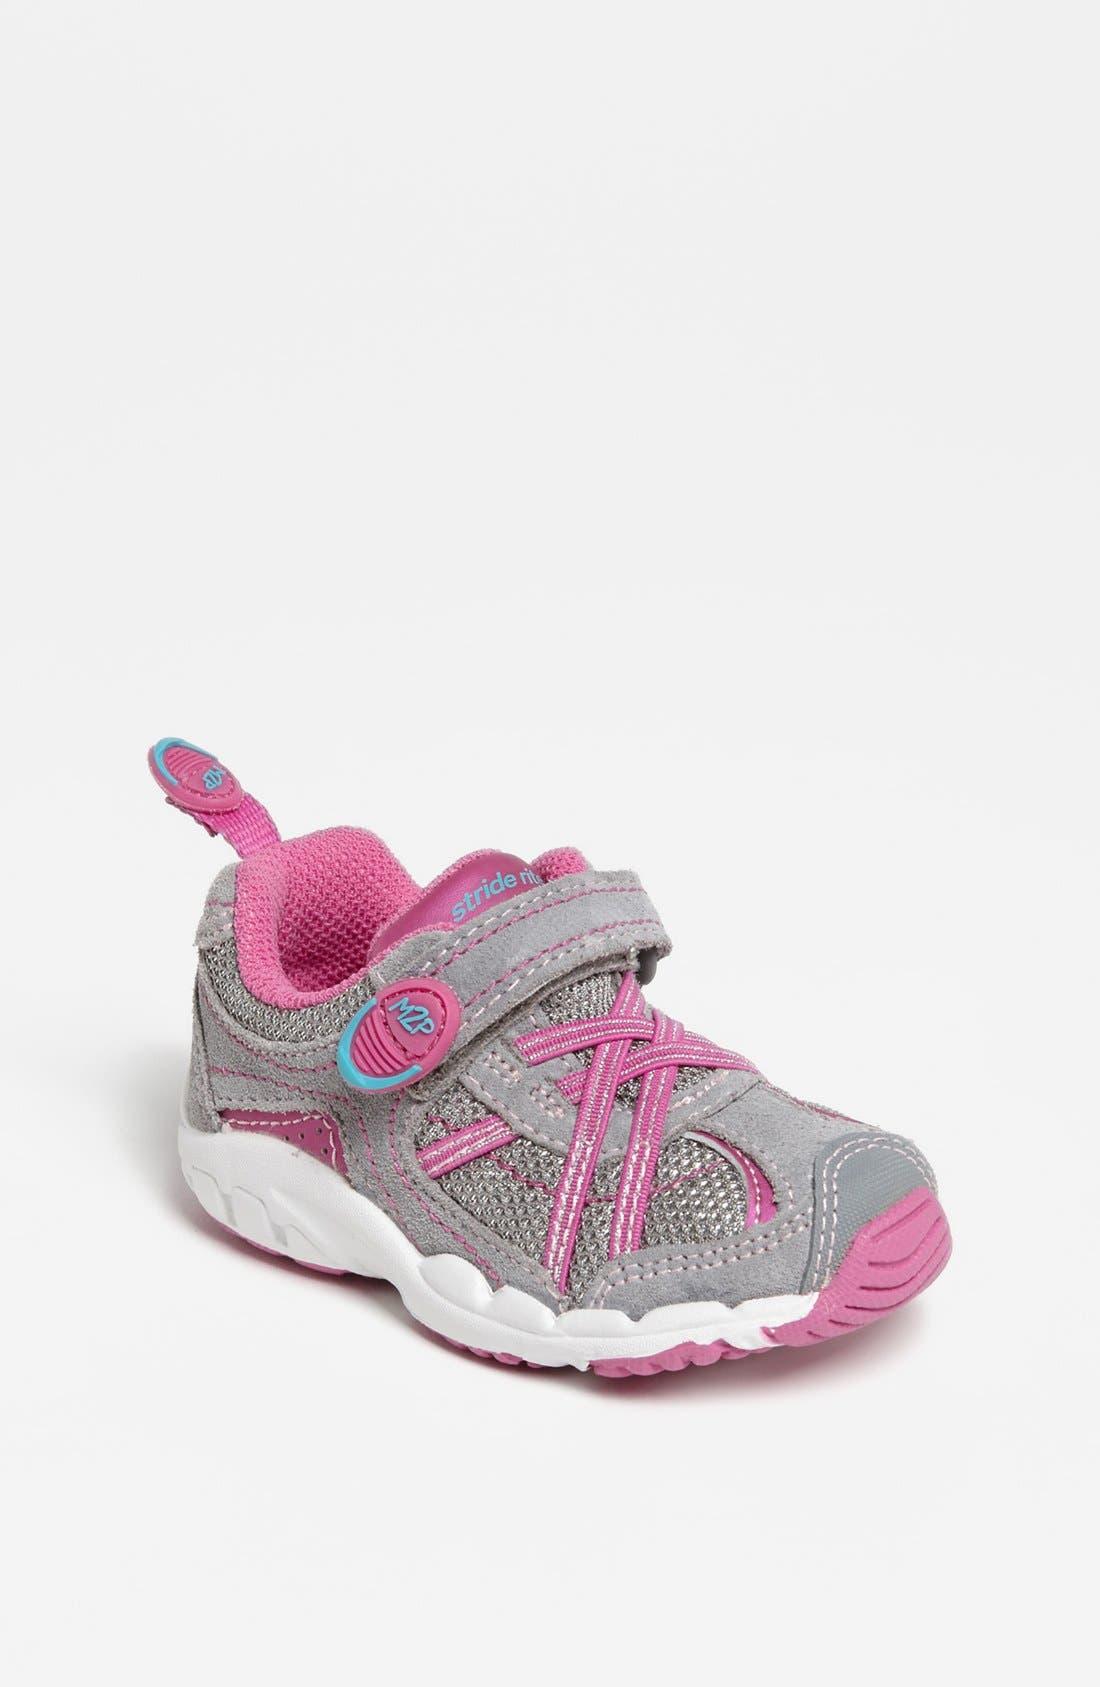 Main Image - Stride Rite 'Made 2 Play™ - Kathryn' Sneaker (Baby, Walker & Toddler)